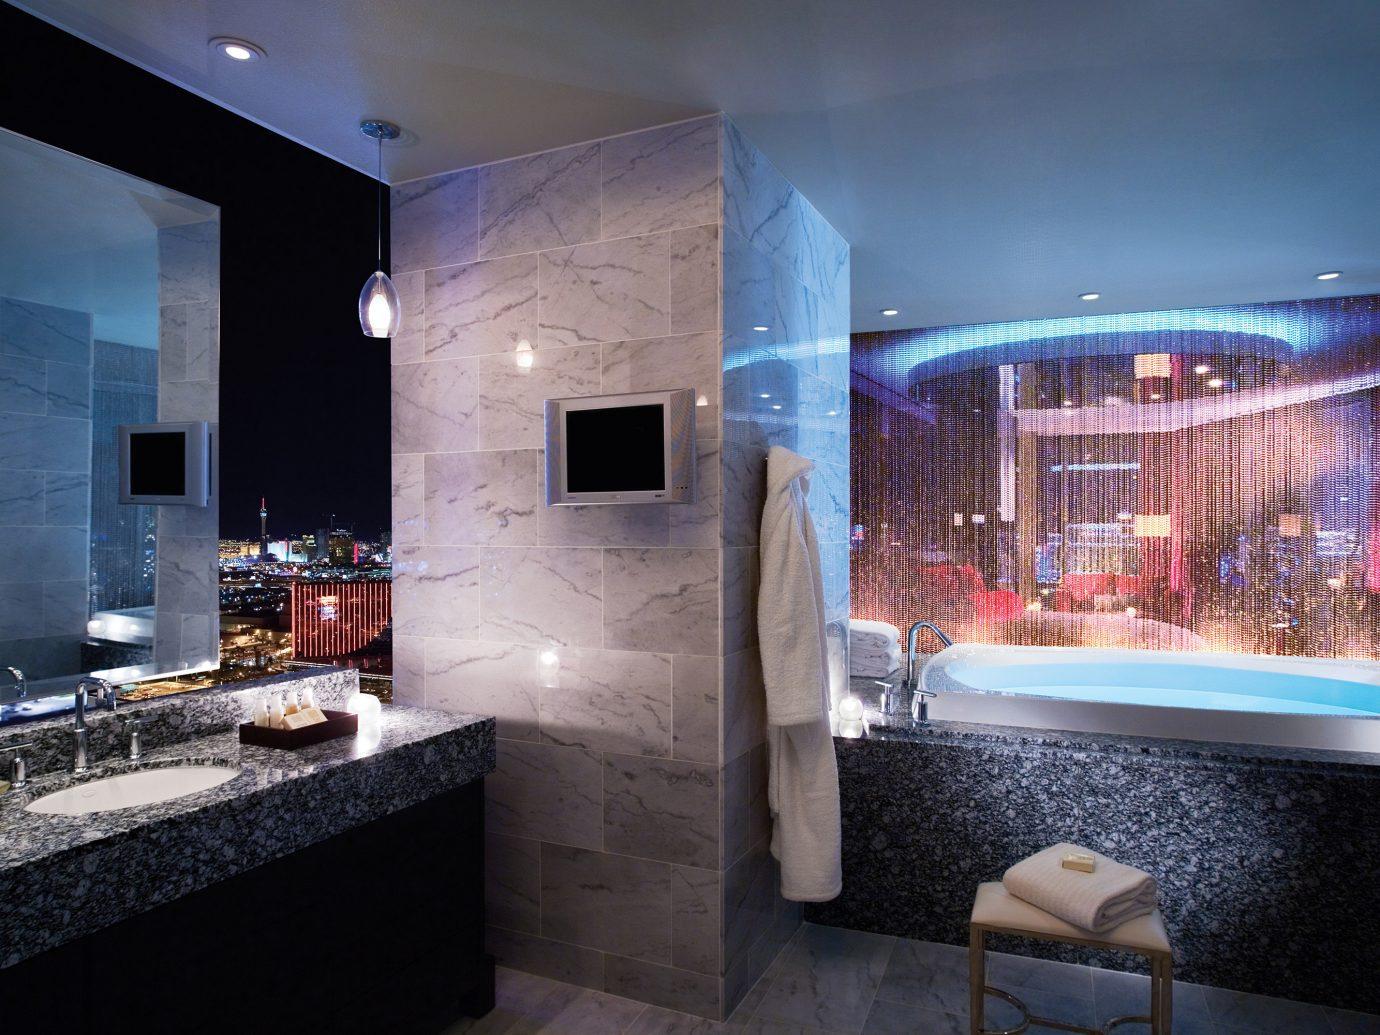 Bathroom in the Sky Villa, Palms Casino Resort in Las Vegas